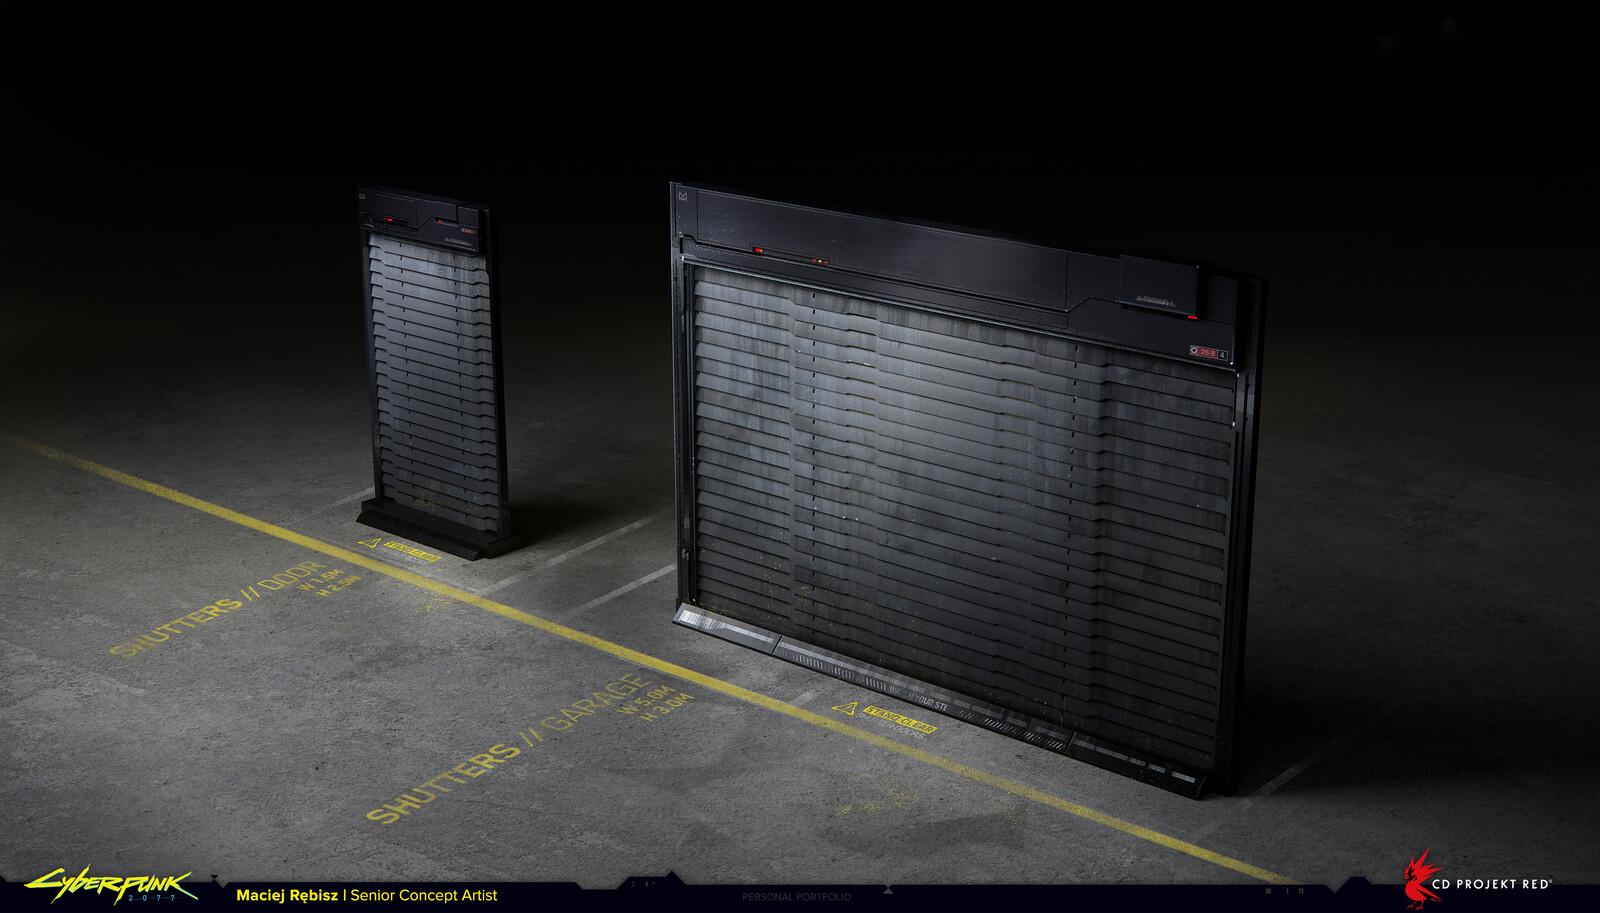 Security gate shutters